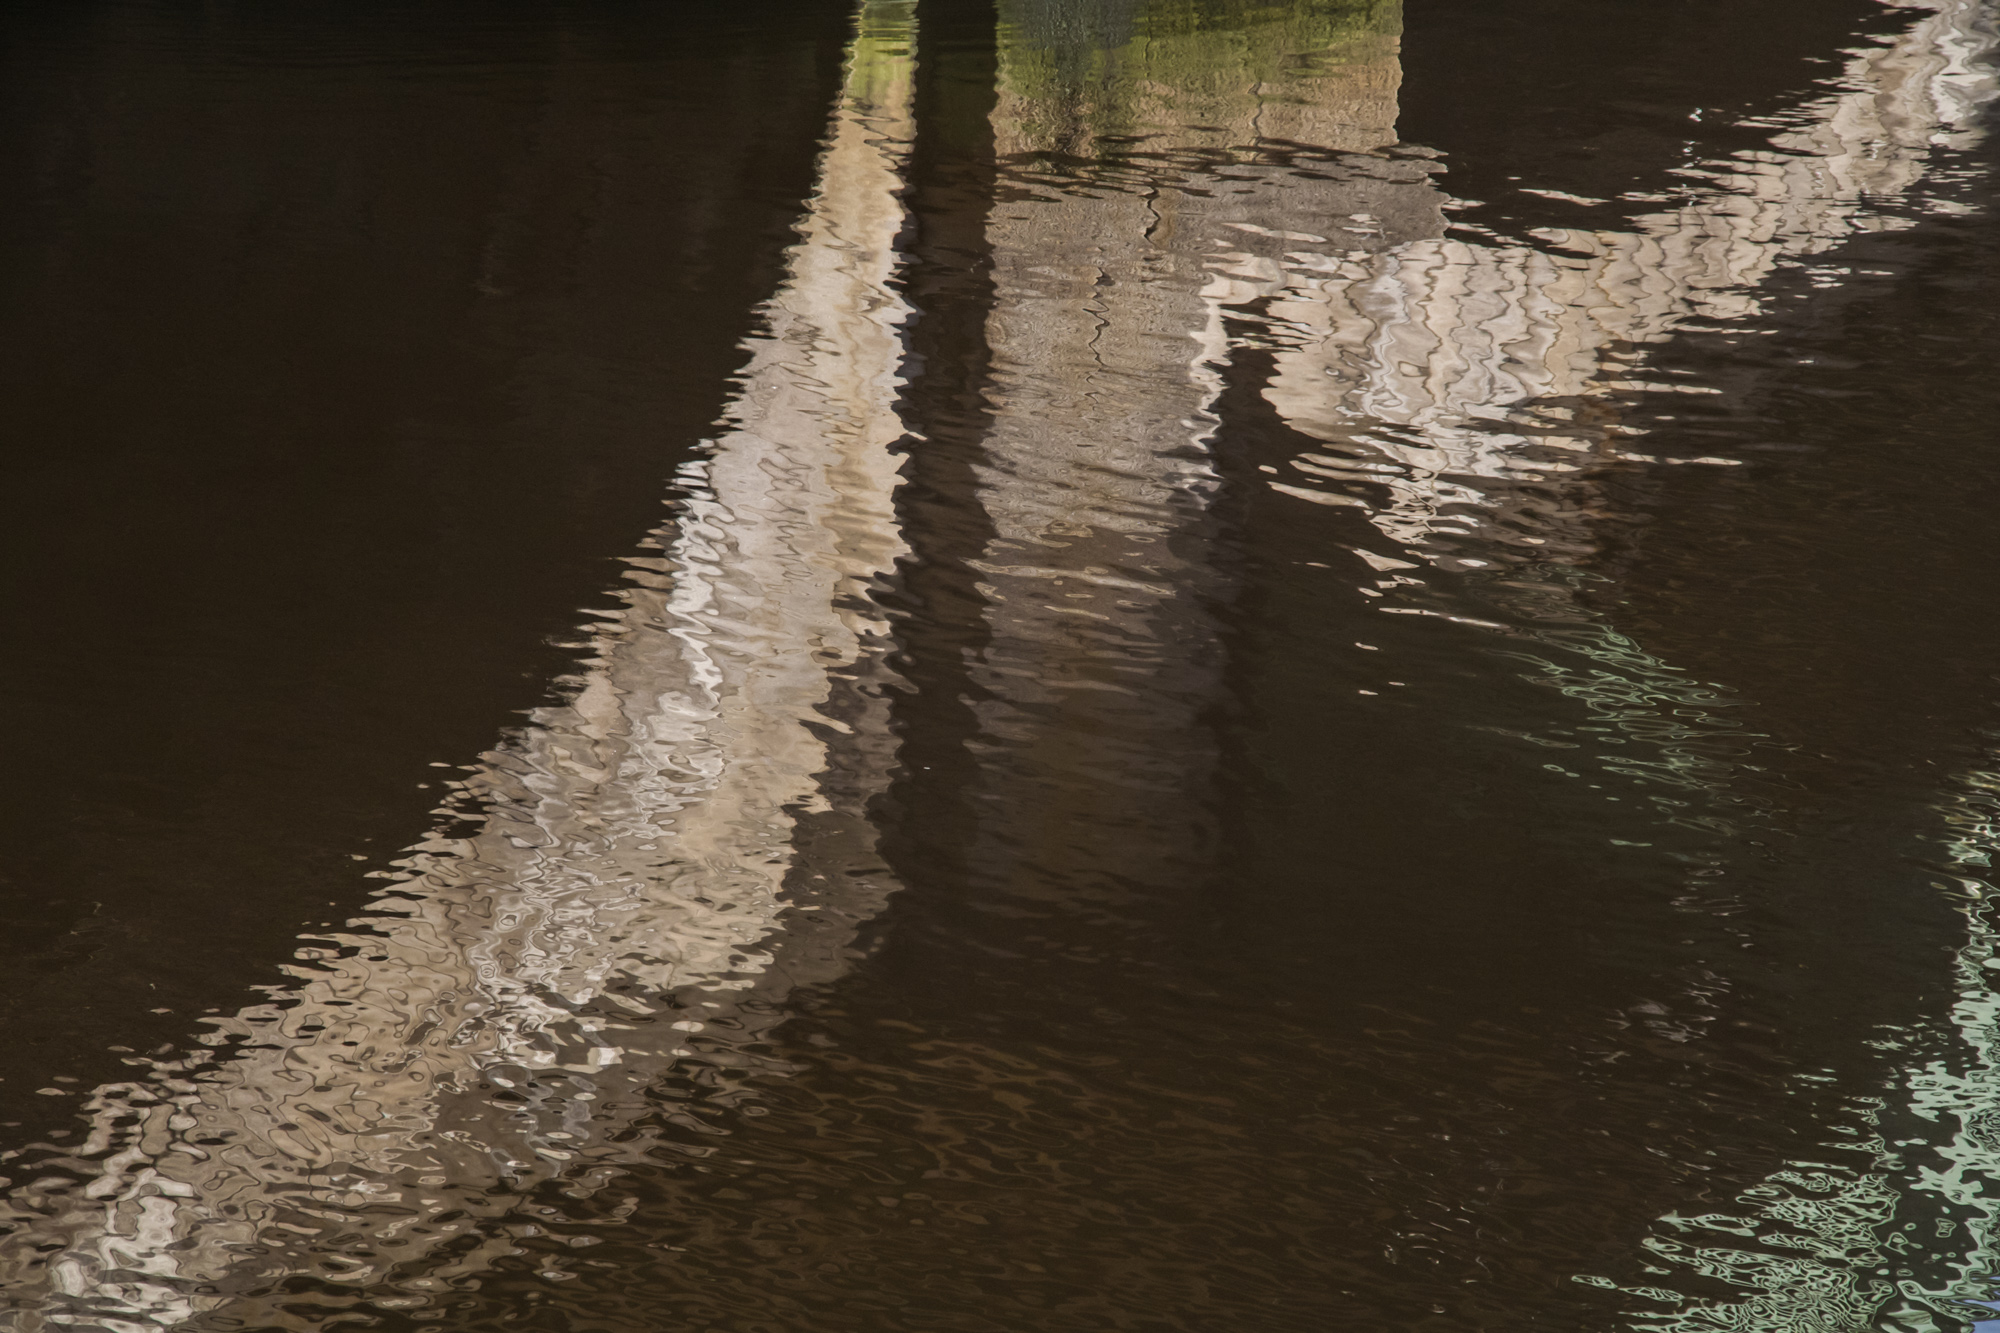 Ode to Monet (Dublin)